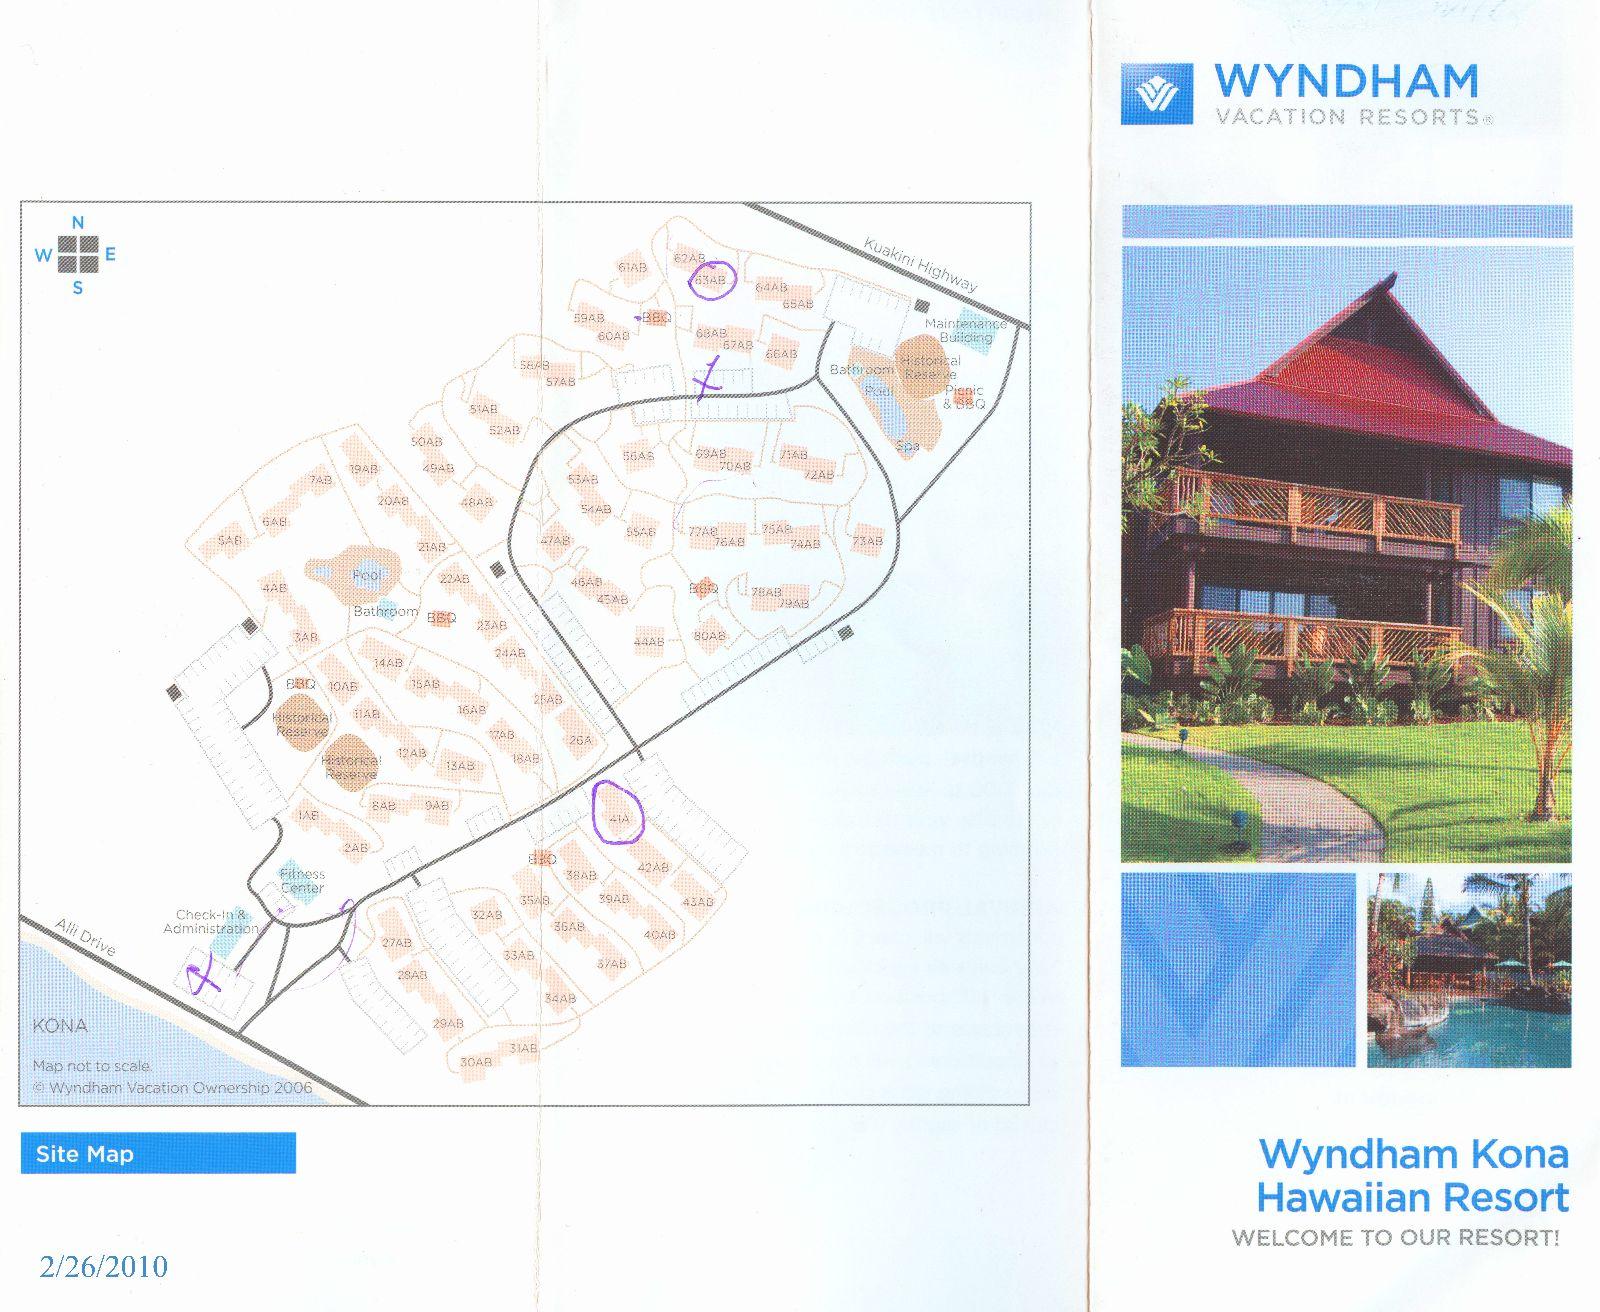 Tug wyndham kona hawaiian resort for The wyndham